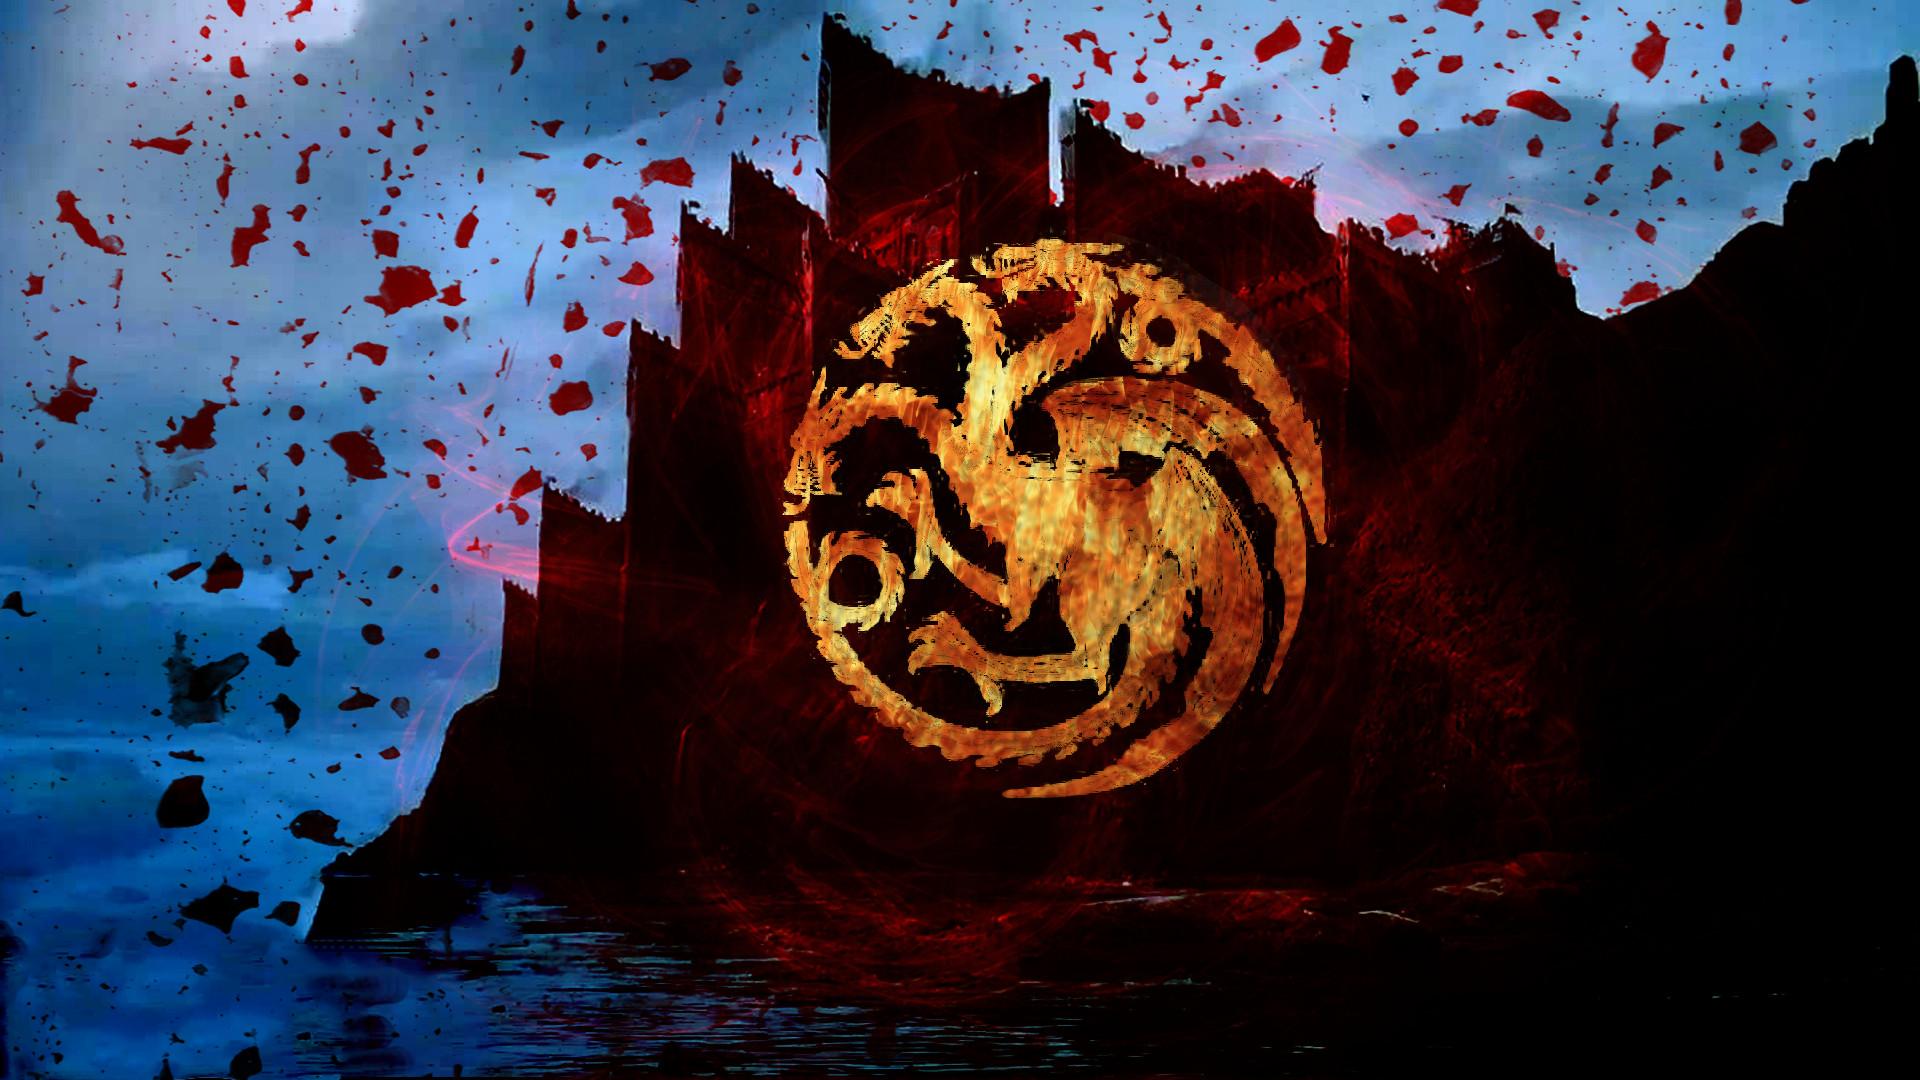 Game Of Thrones House Wallpapers – WallpaperSafari